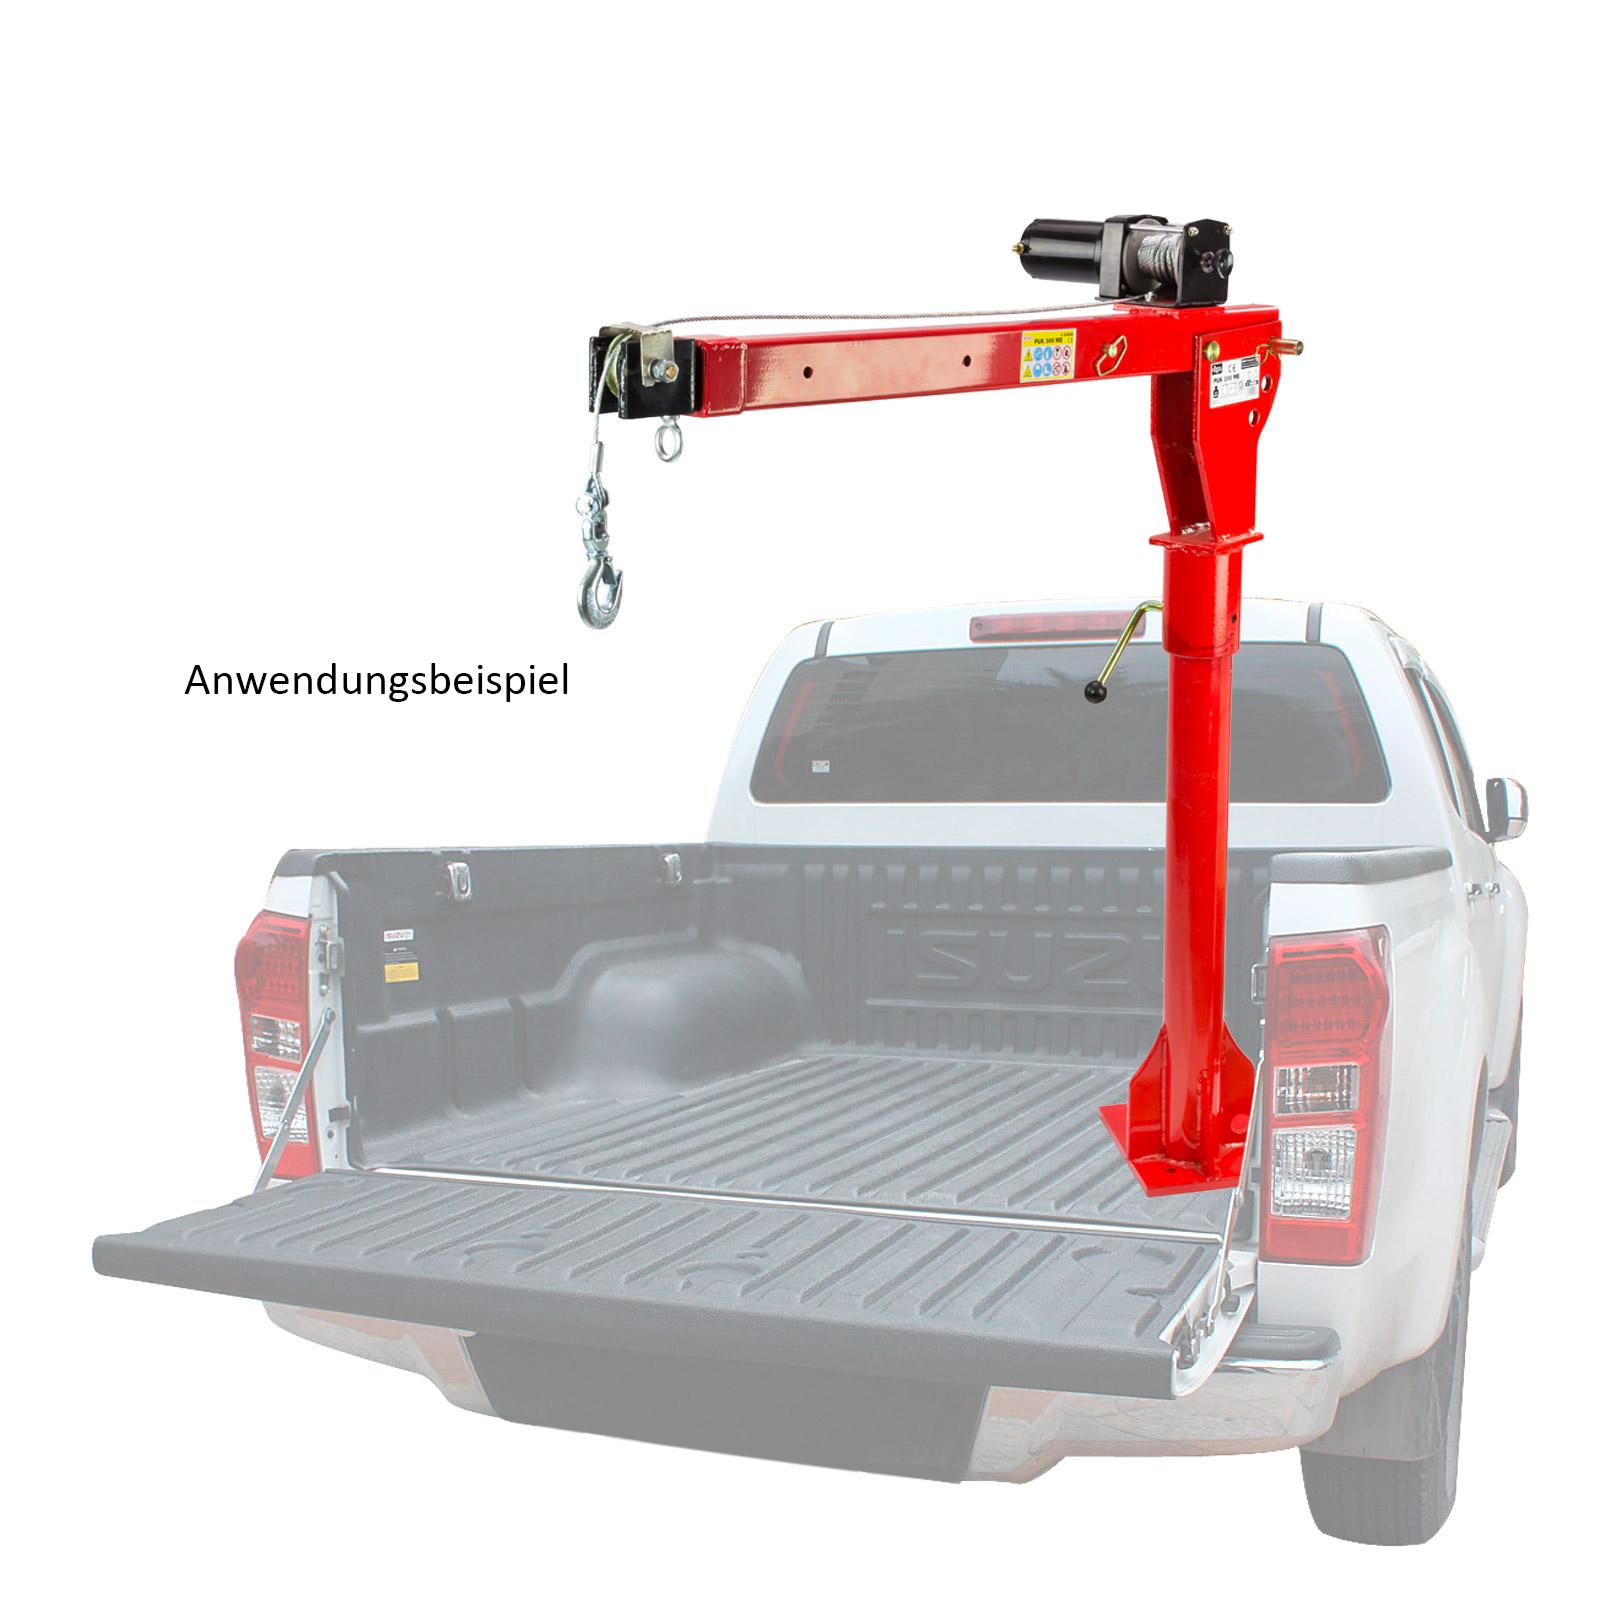 ladekran winde pickup kran hebekran lift pick up 24524 ebay. Black Bedroom Furniture Sets. Home Design Ideas